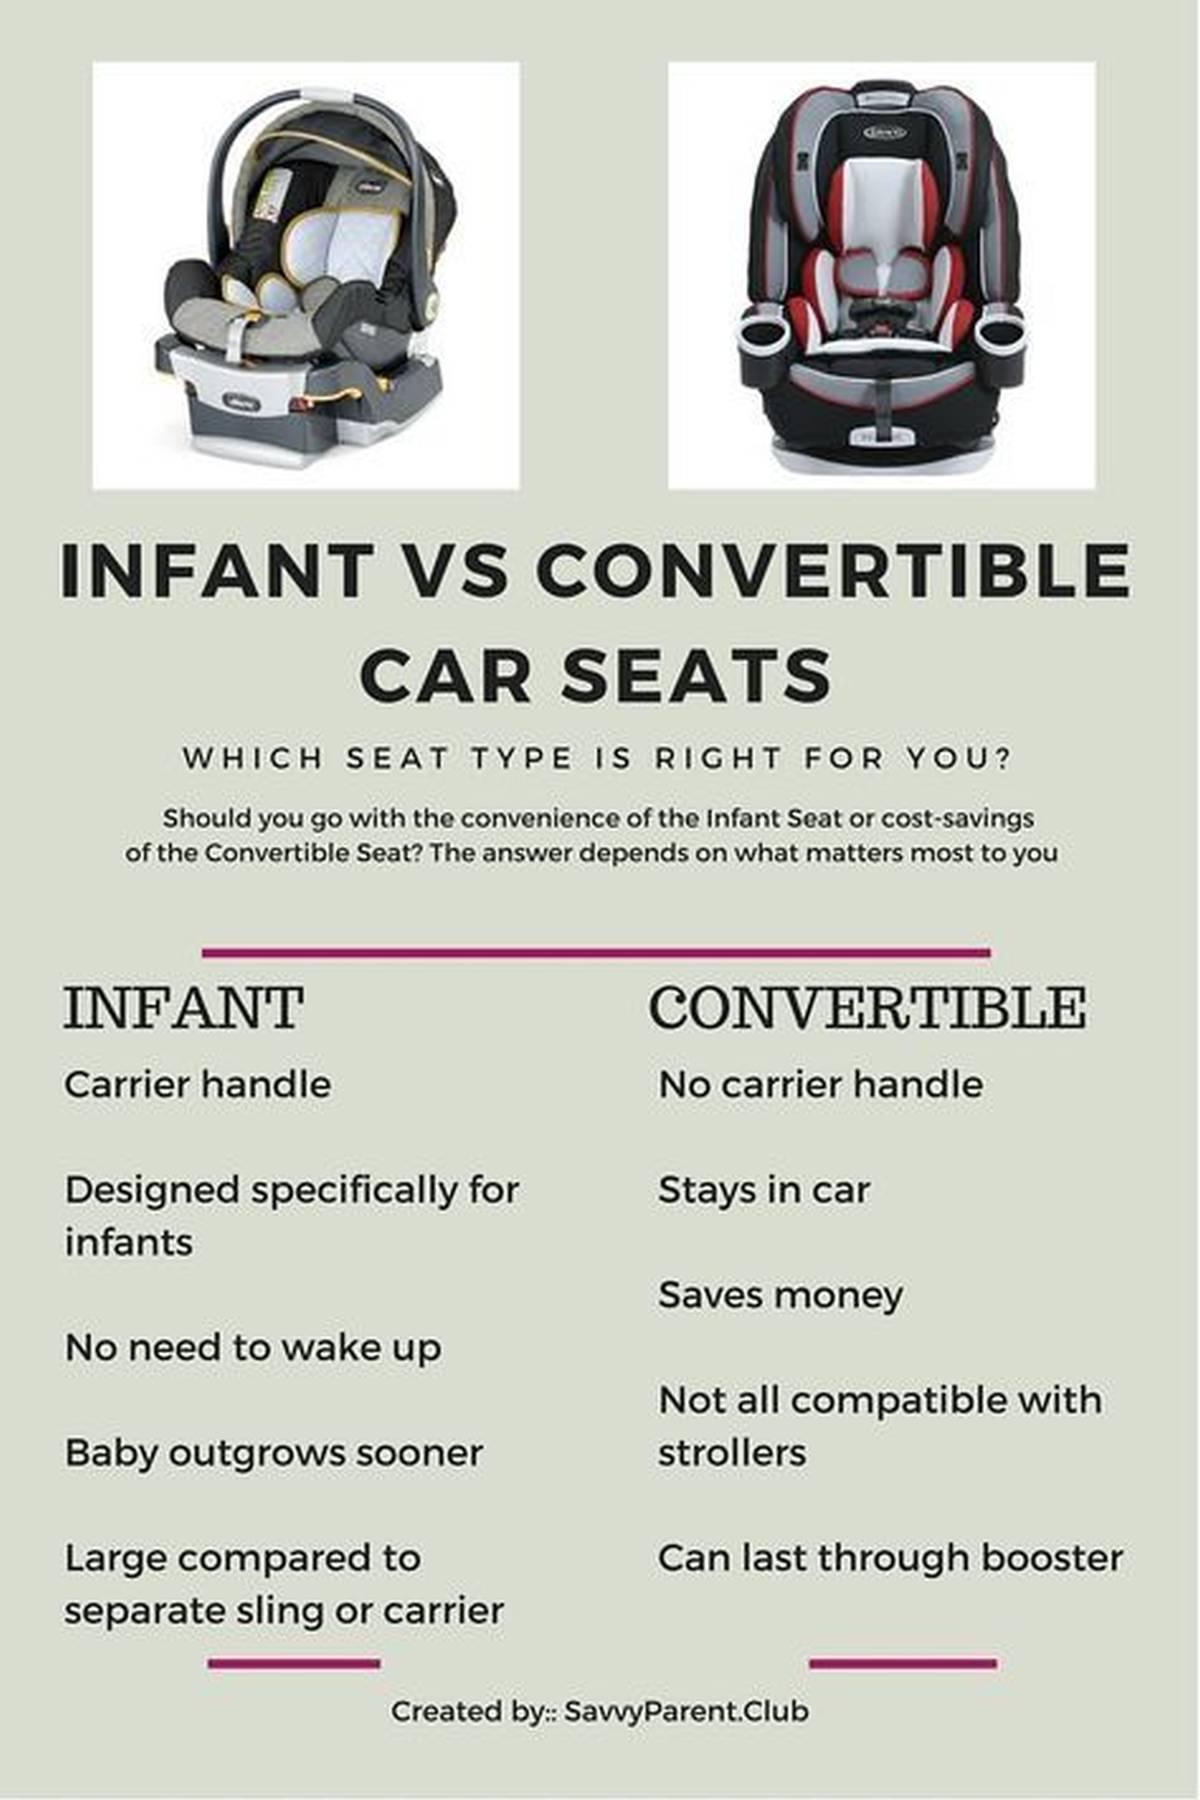 infant vs convertible car seats comparisonchart